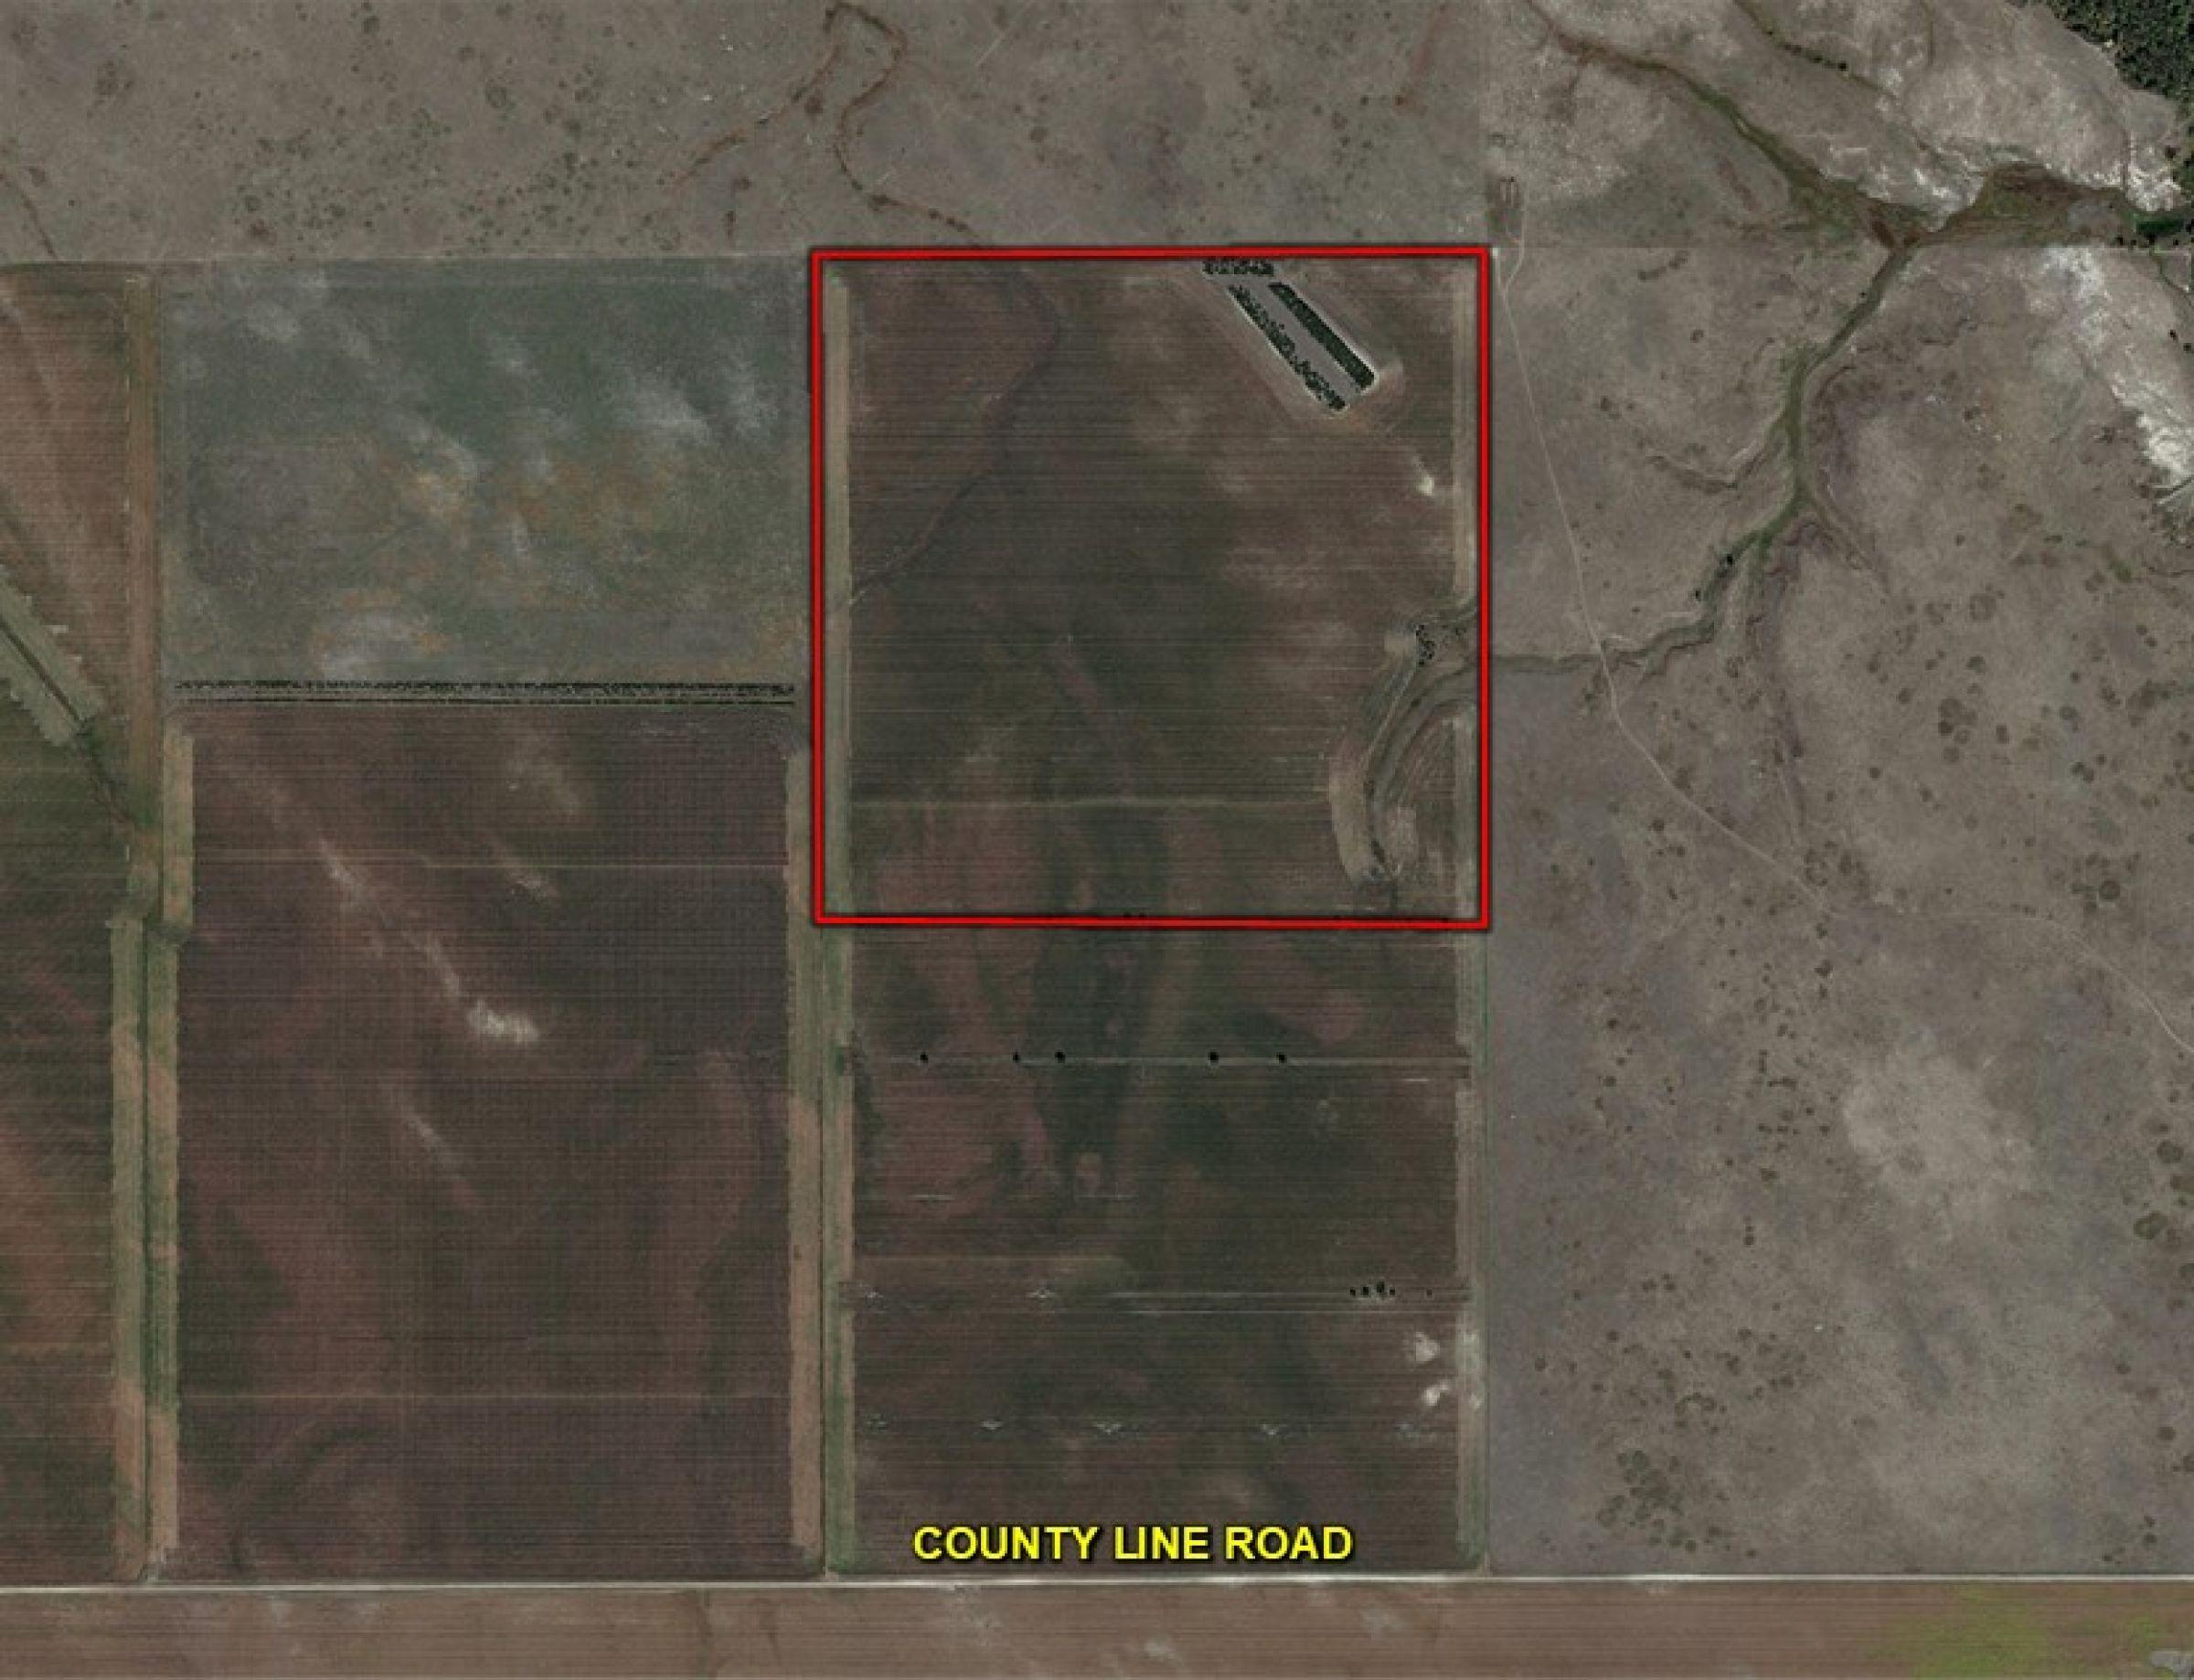 4-county-line-road-57566-0-2020-09-30-194455.jpg